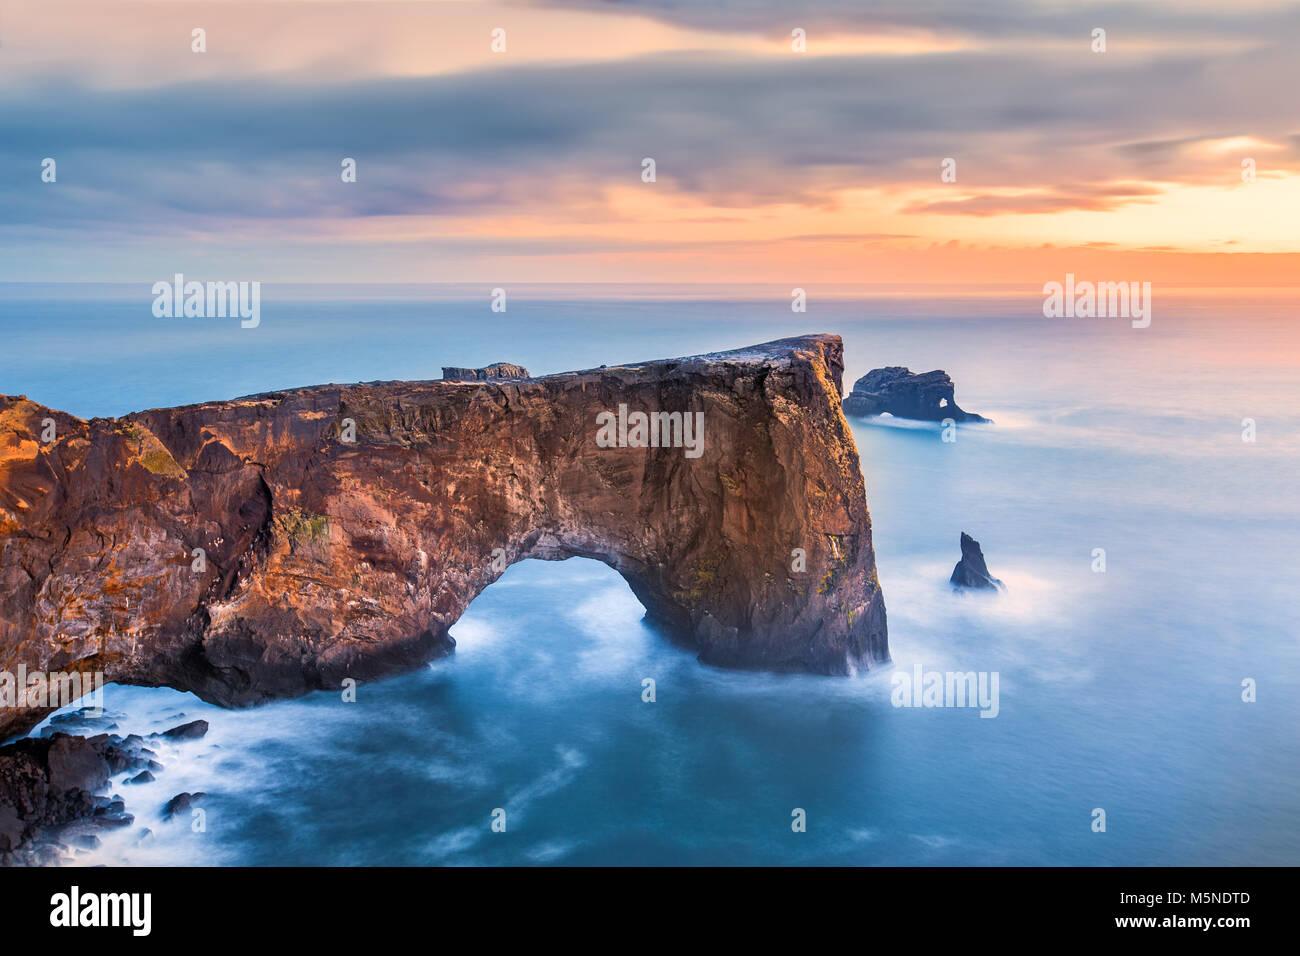 Dyrholaey Felsformation bei Sonnenuntergang. Dyrholaey ist eine Landzunge an der Südküste Islands entfernt, Stockbild